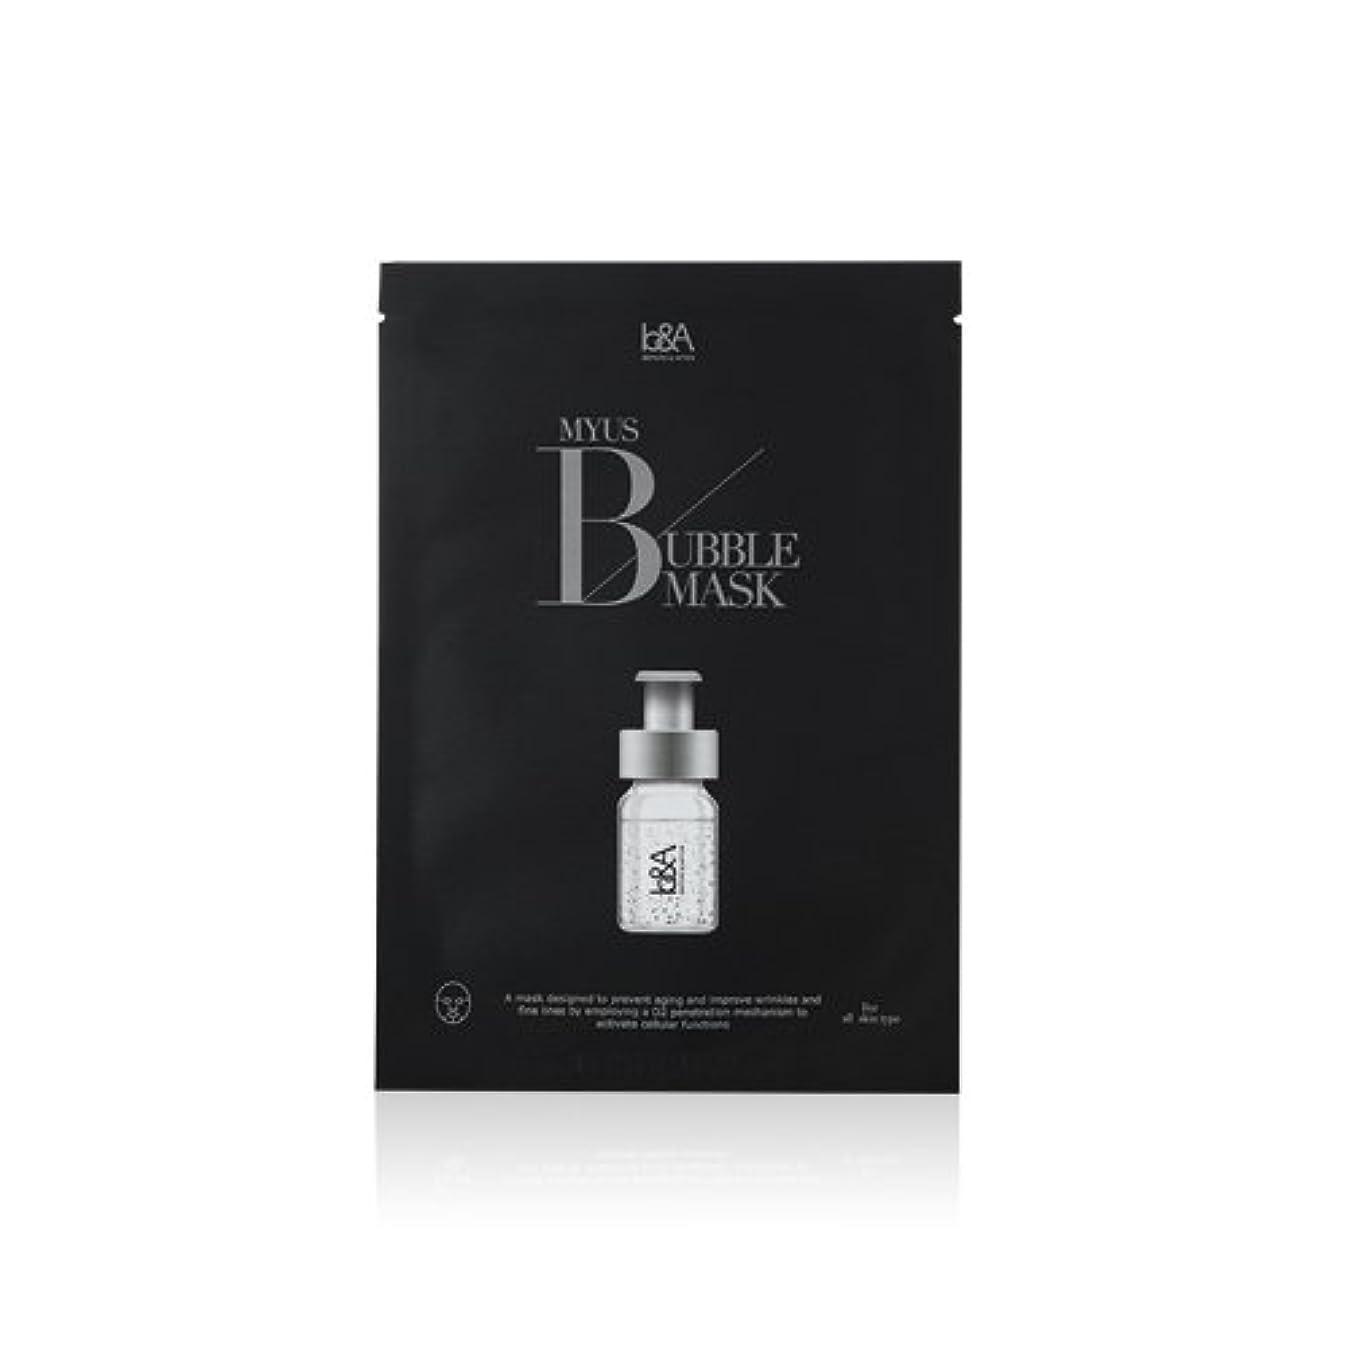 信頼ブランク迷彩BigBang Top [K cosmetic][K beauty] Celeb's-Secret MYUS BUBBLE MASK 5pcs [海外直送品][並行輸入品]